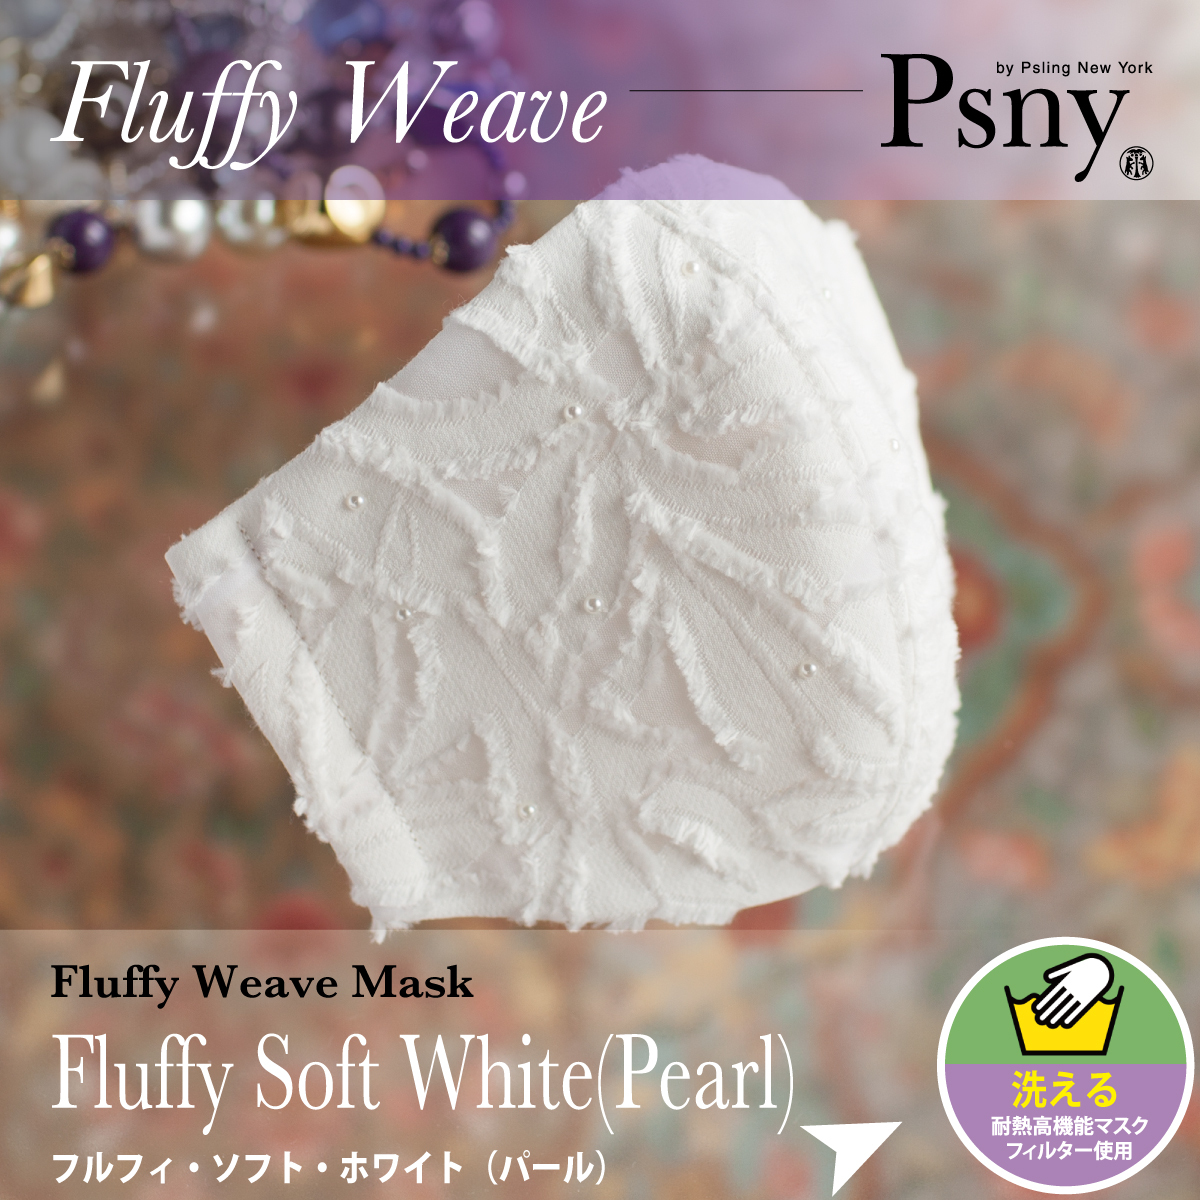 PSNY フルフィ・ソフト ホワイト パール 花粉 黄砂 洗えるフィルター入り 立体 マスク 大人用